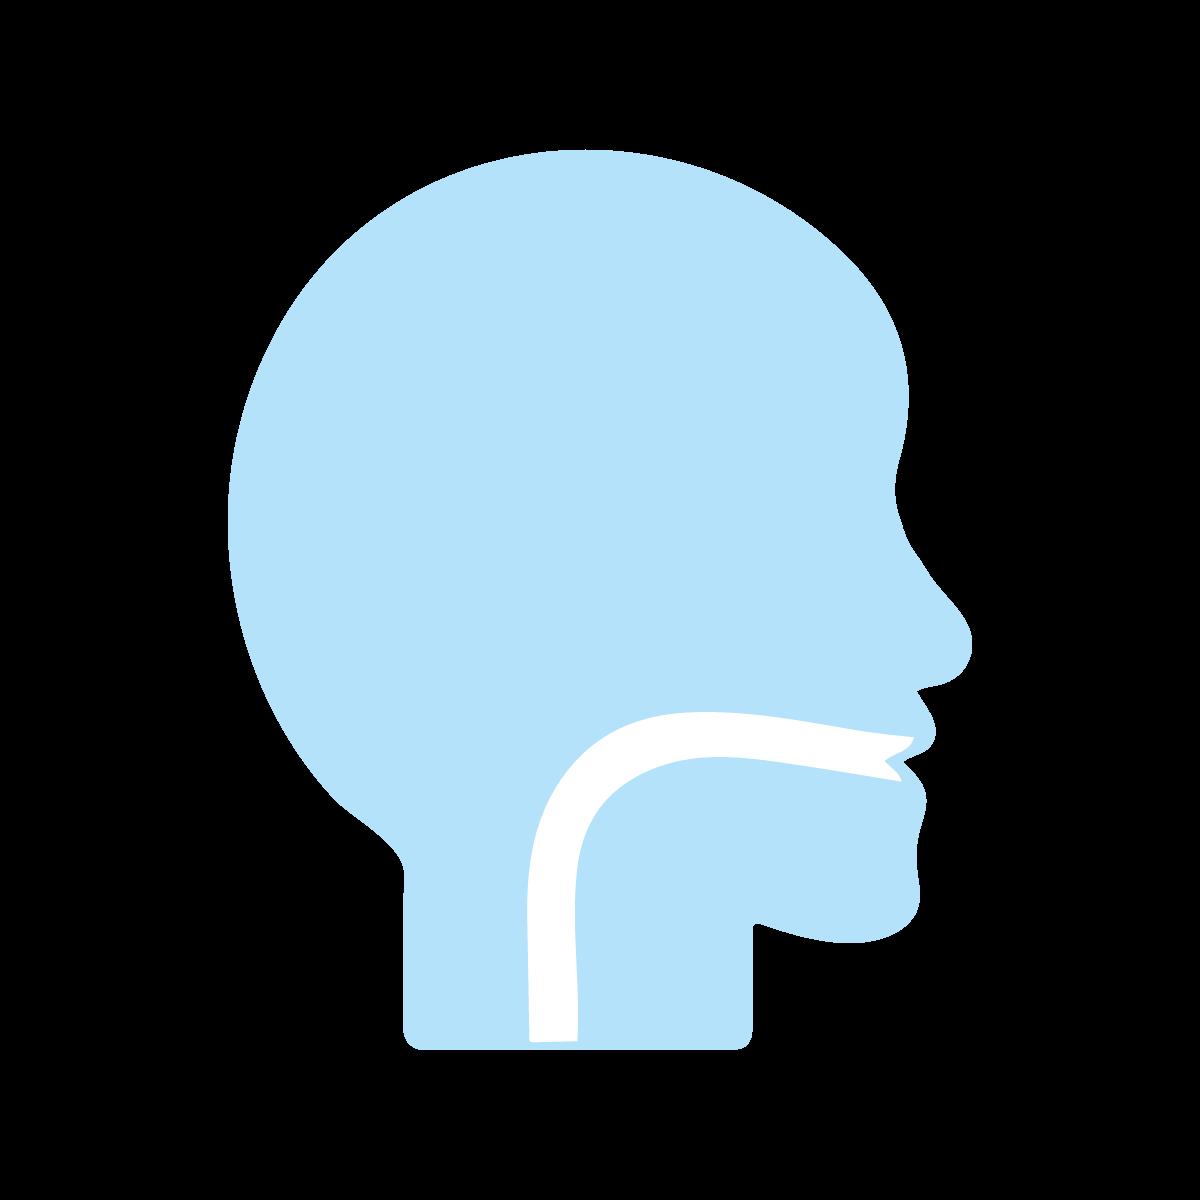 Laryngeal Videostroboscopy - stroboscopic evaluation of voice